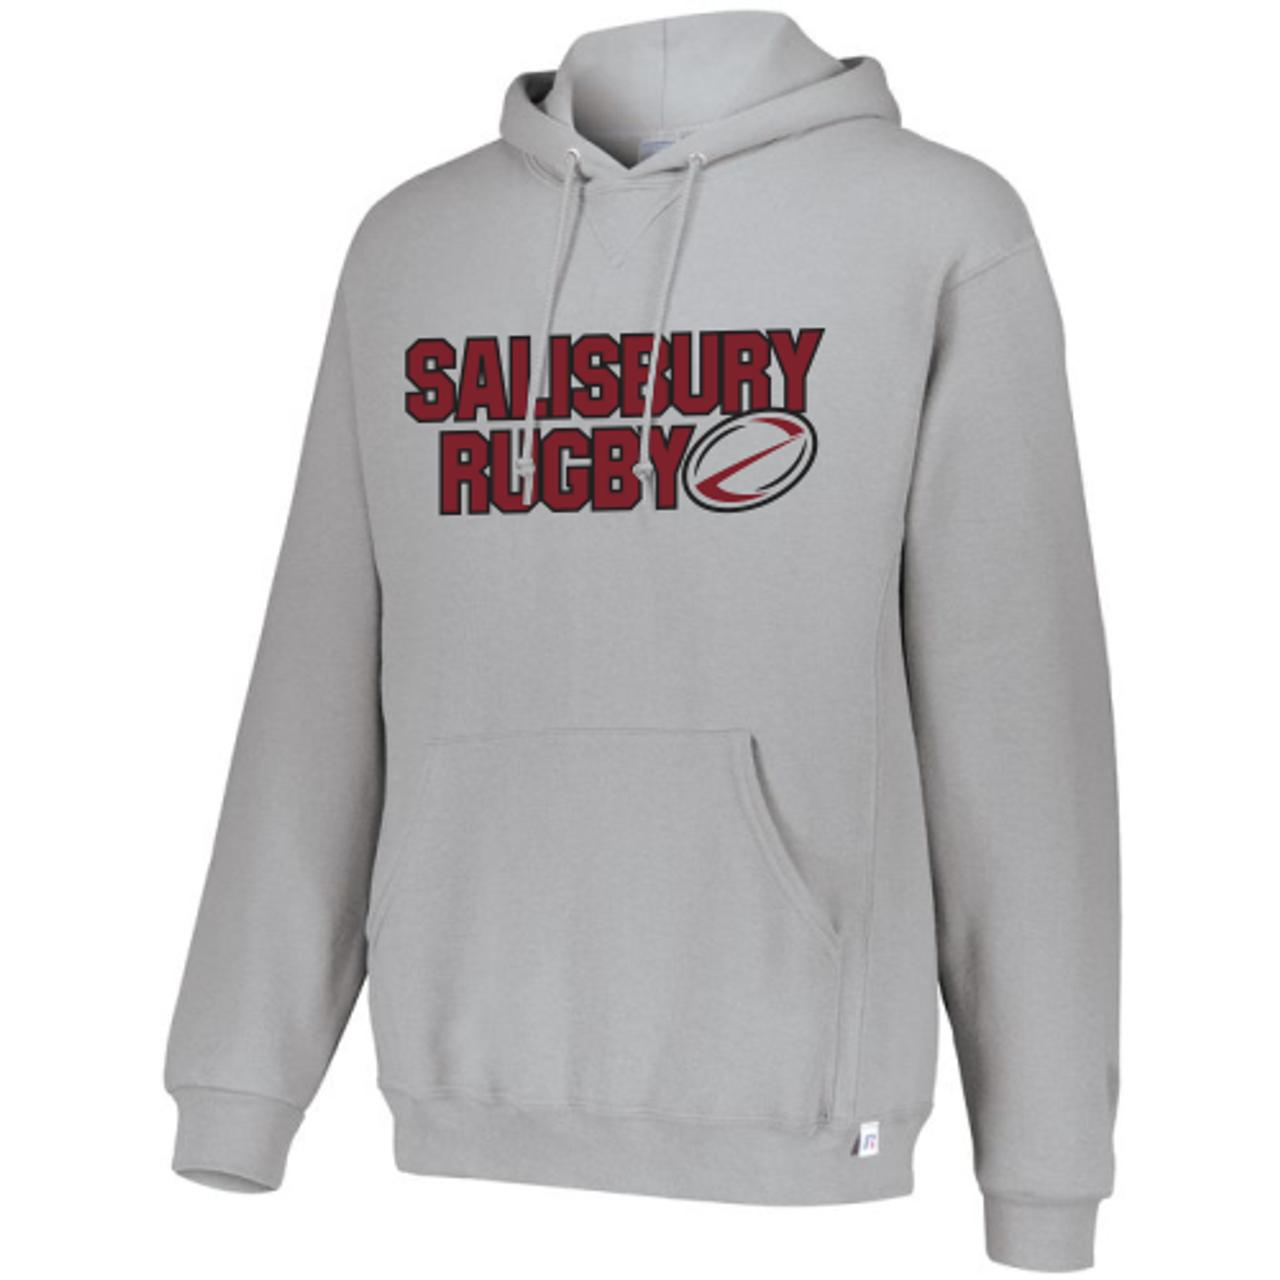 Salisbury WRFC Hoodie, Gray